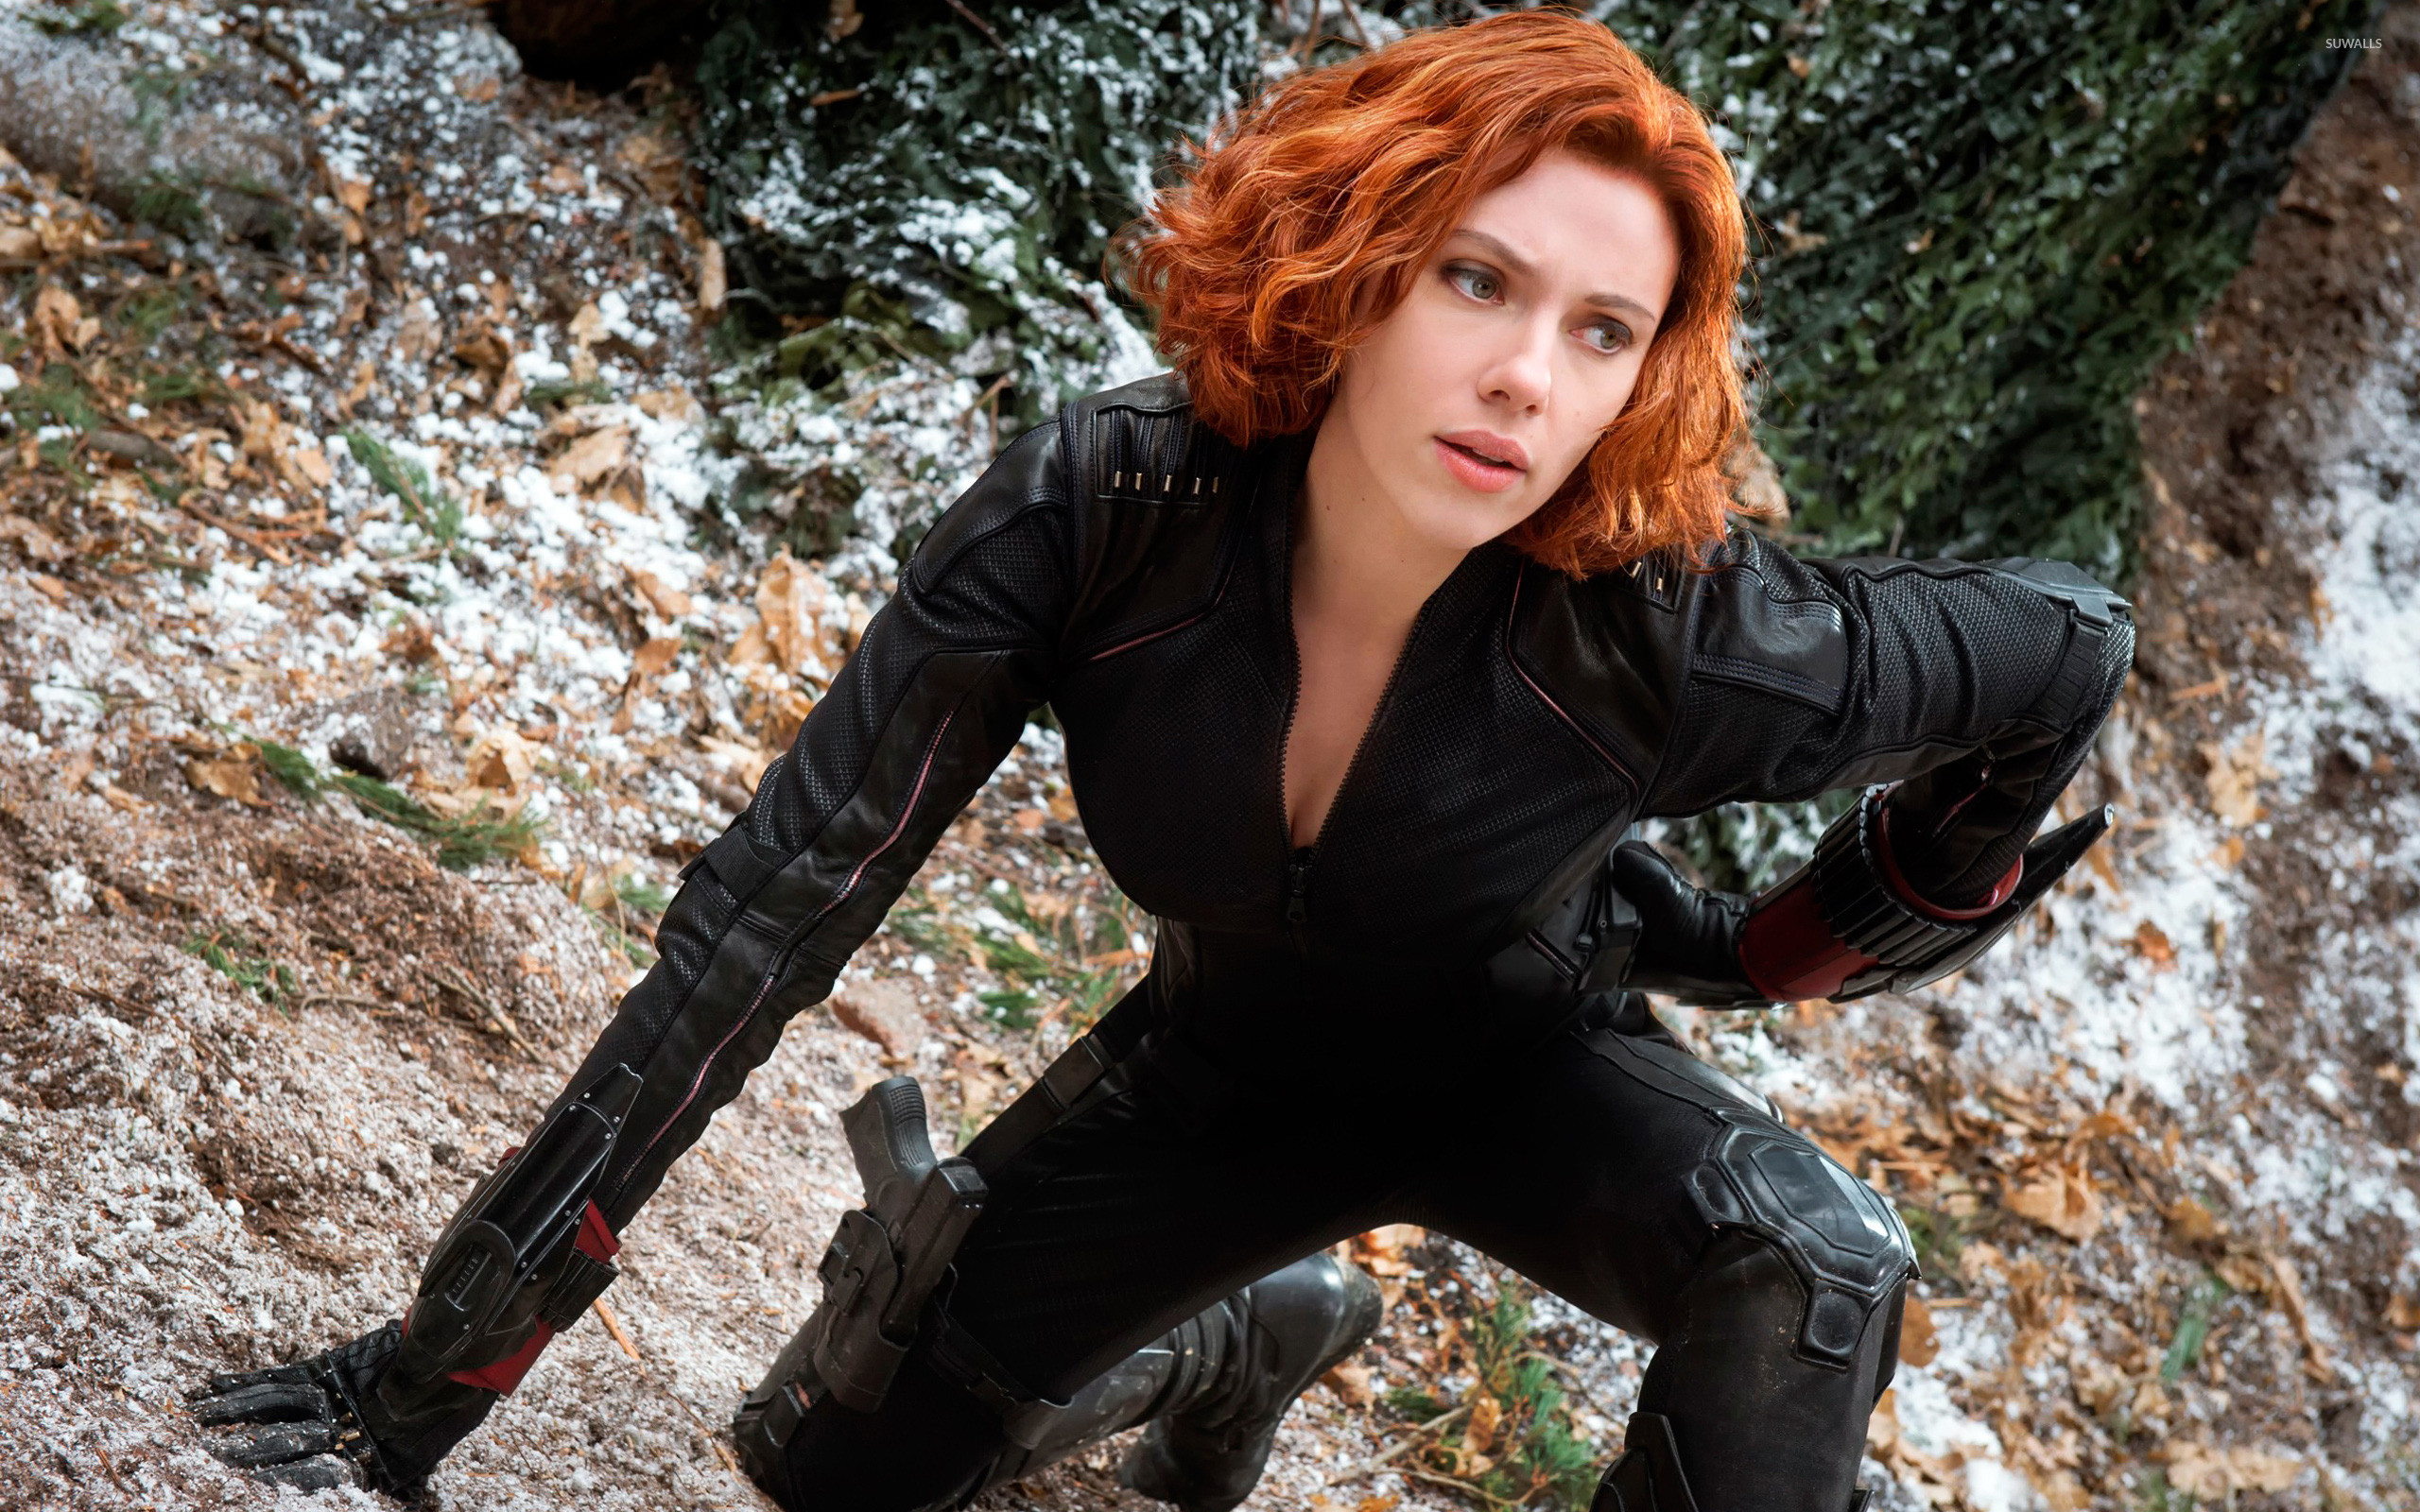 Black Widow – Avengers: Age of Ultron wallpaper